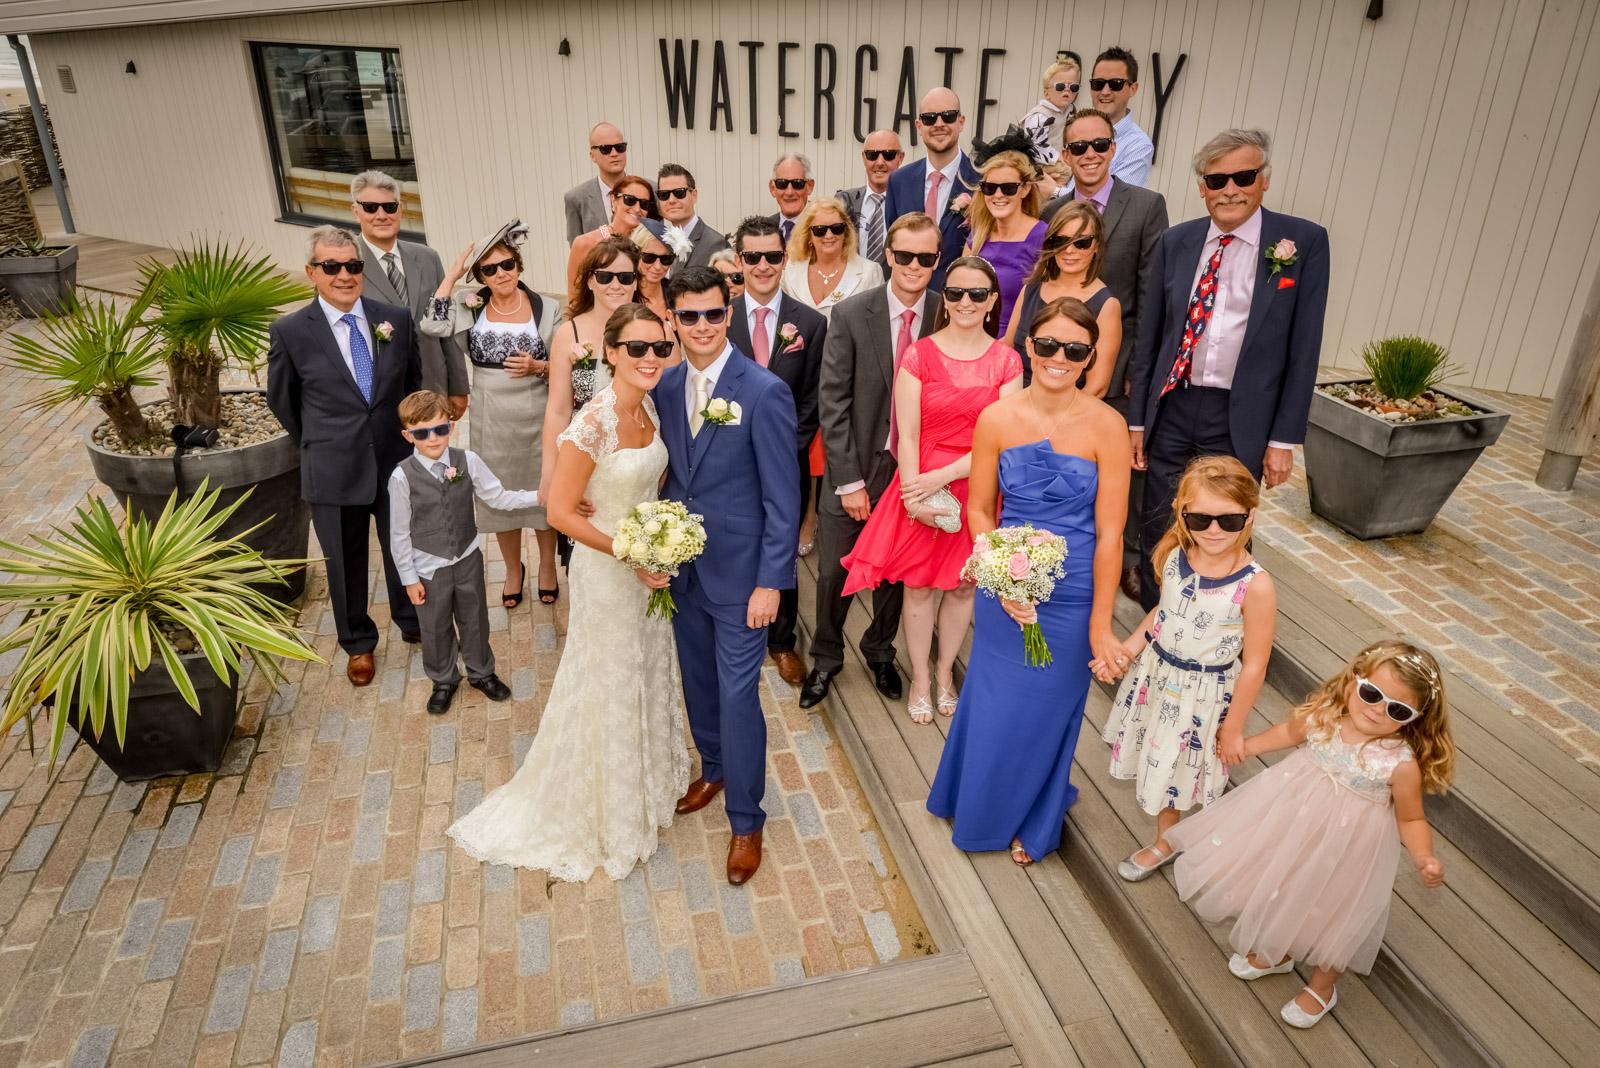 watergate-bay-hotel-wedding-photography-62.jpg